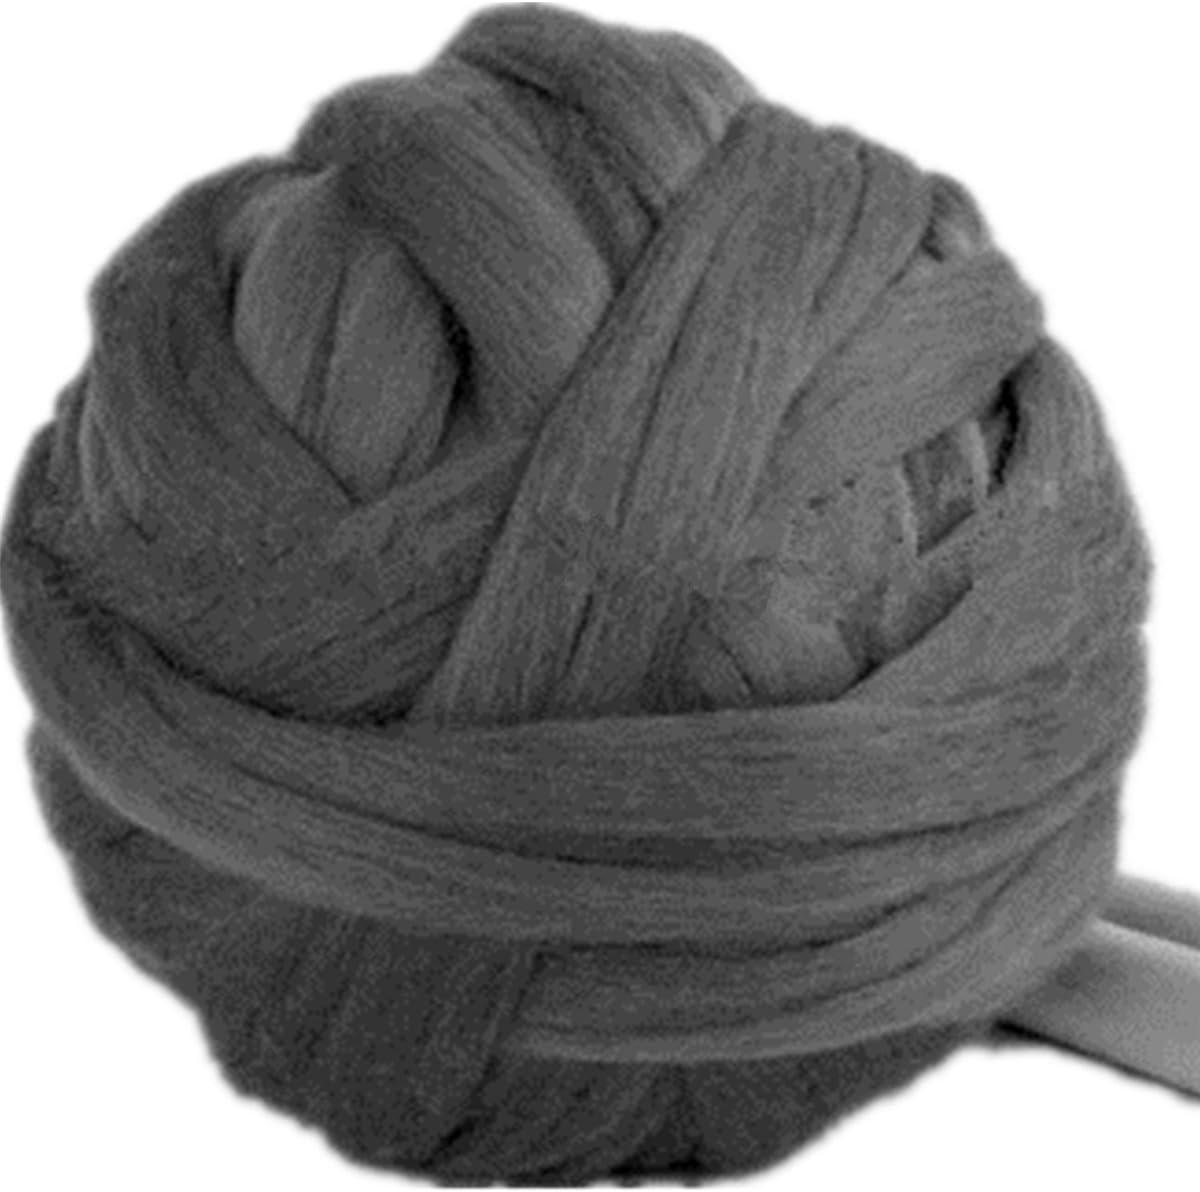 Giant Fil Grosse pelote de laine 1 kg (1 kilogram) Super